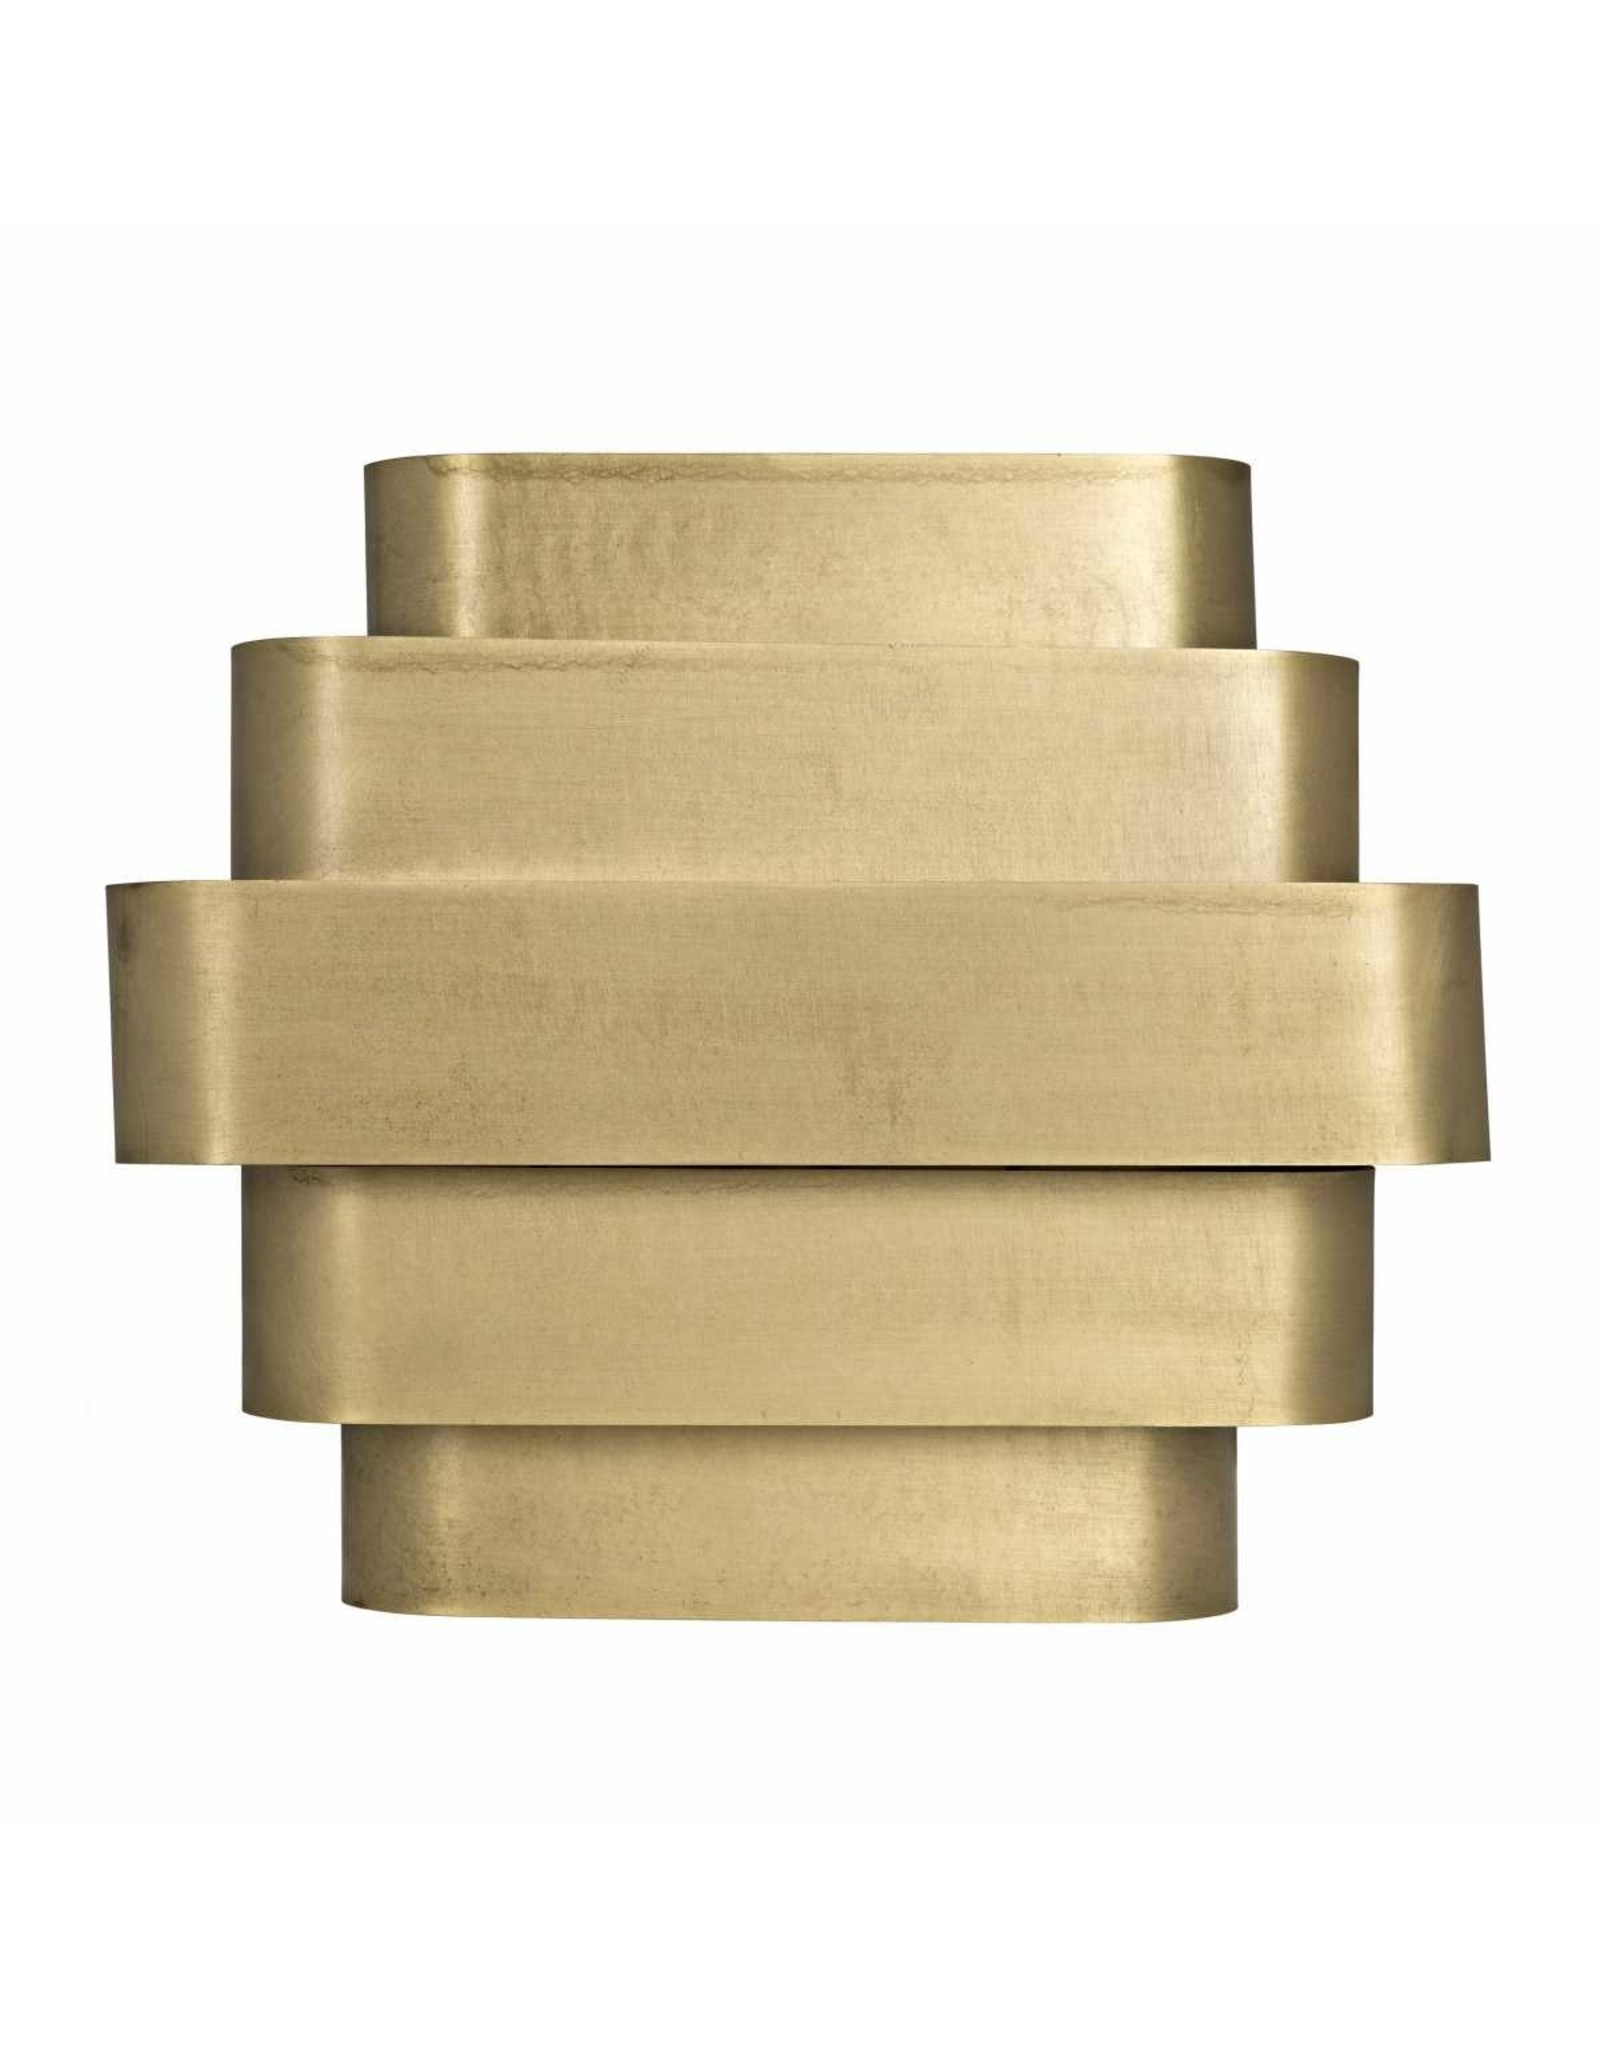 Website Noir Baas Sconce - Antique Brass